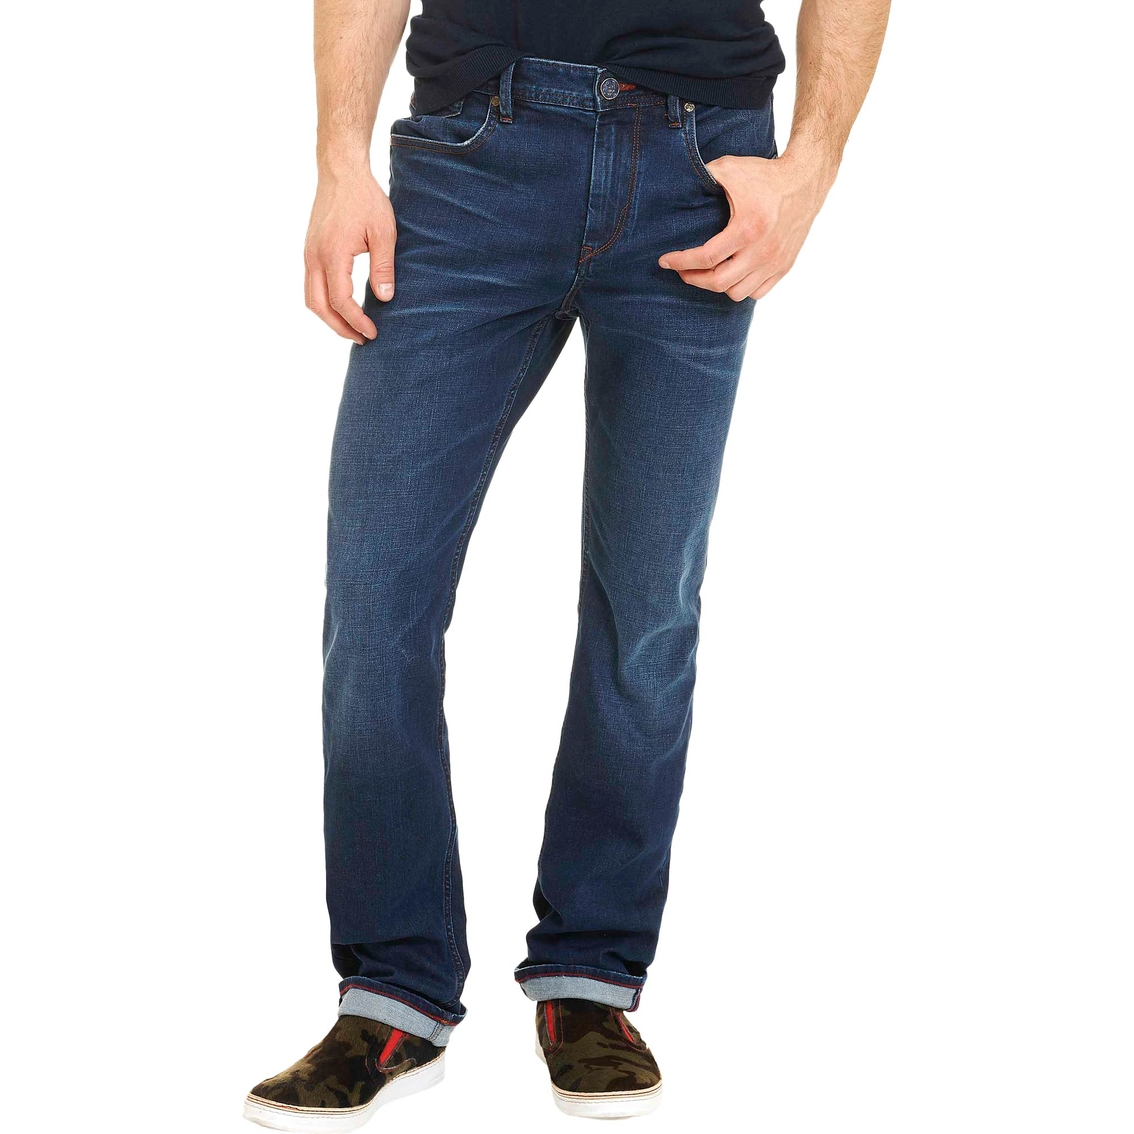 97d31ddd Robert Graham Morris Tailored Fit Denim Jeans   Jeans   Apparel ...